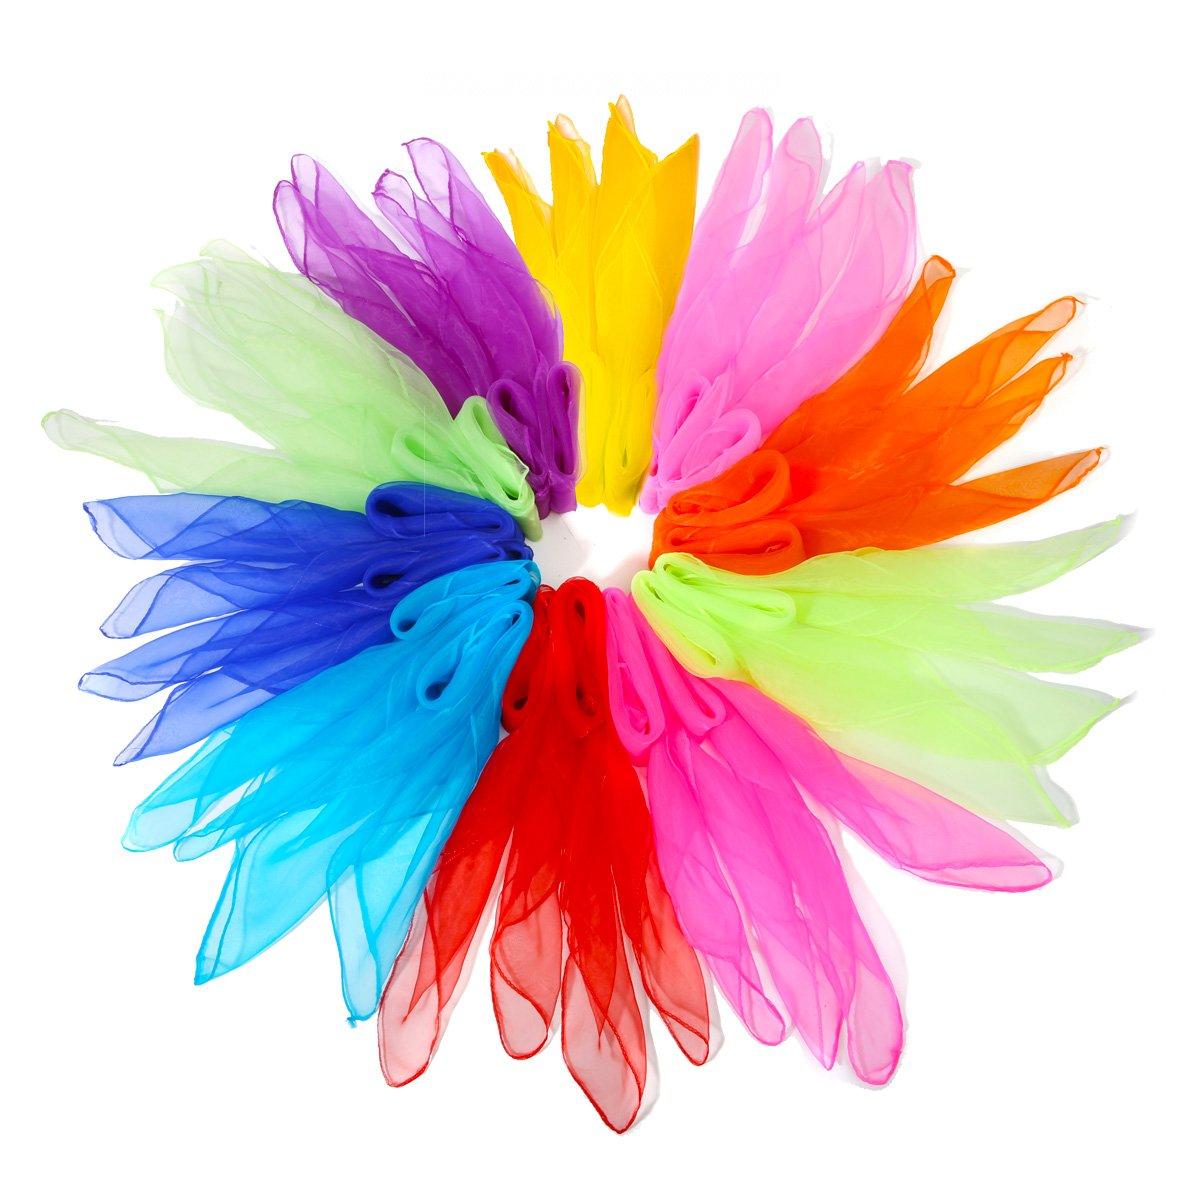 NASUM Dance Scarves, 20 Pieces Square Juggling Silk Dance Scarves Movement Scarves Magic Tricks Performance Props Accessories ,Random Color Delivery